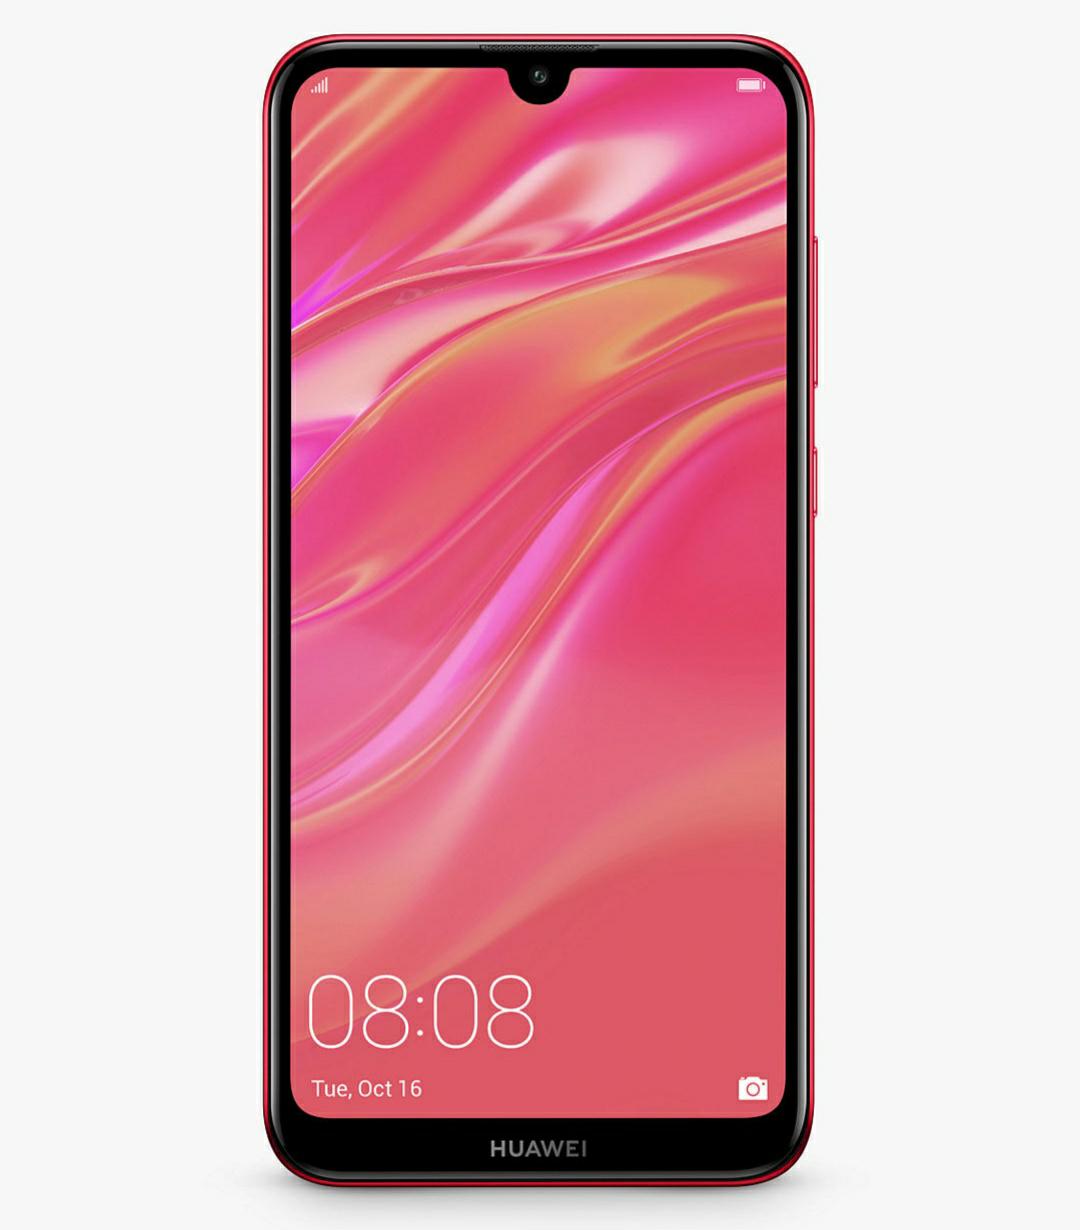 Huawei Y7 2019 Smartphone 32GB 4000mah Battery - Headphone Jack!! £179.99 @ John Lewis & Partners + £158 @ Amazon Germany